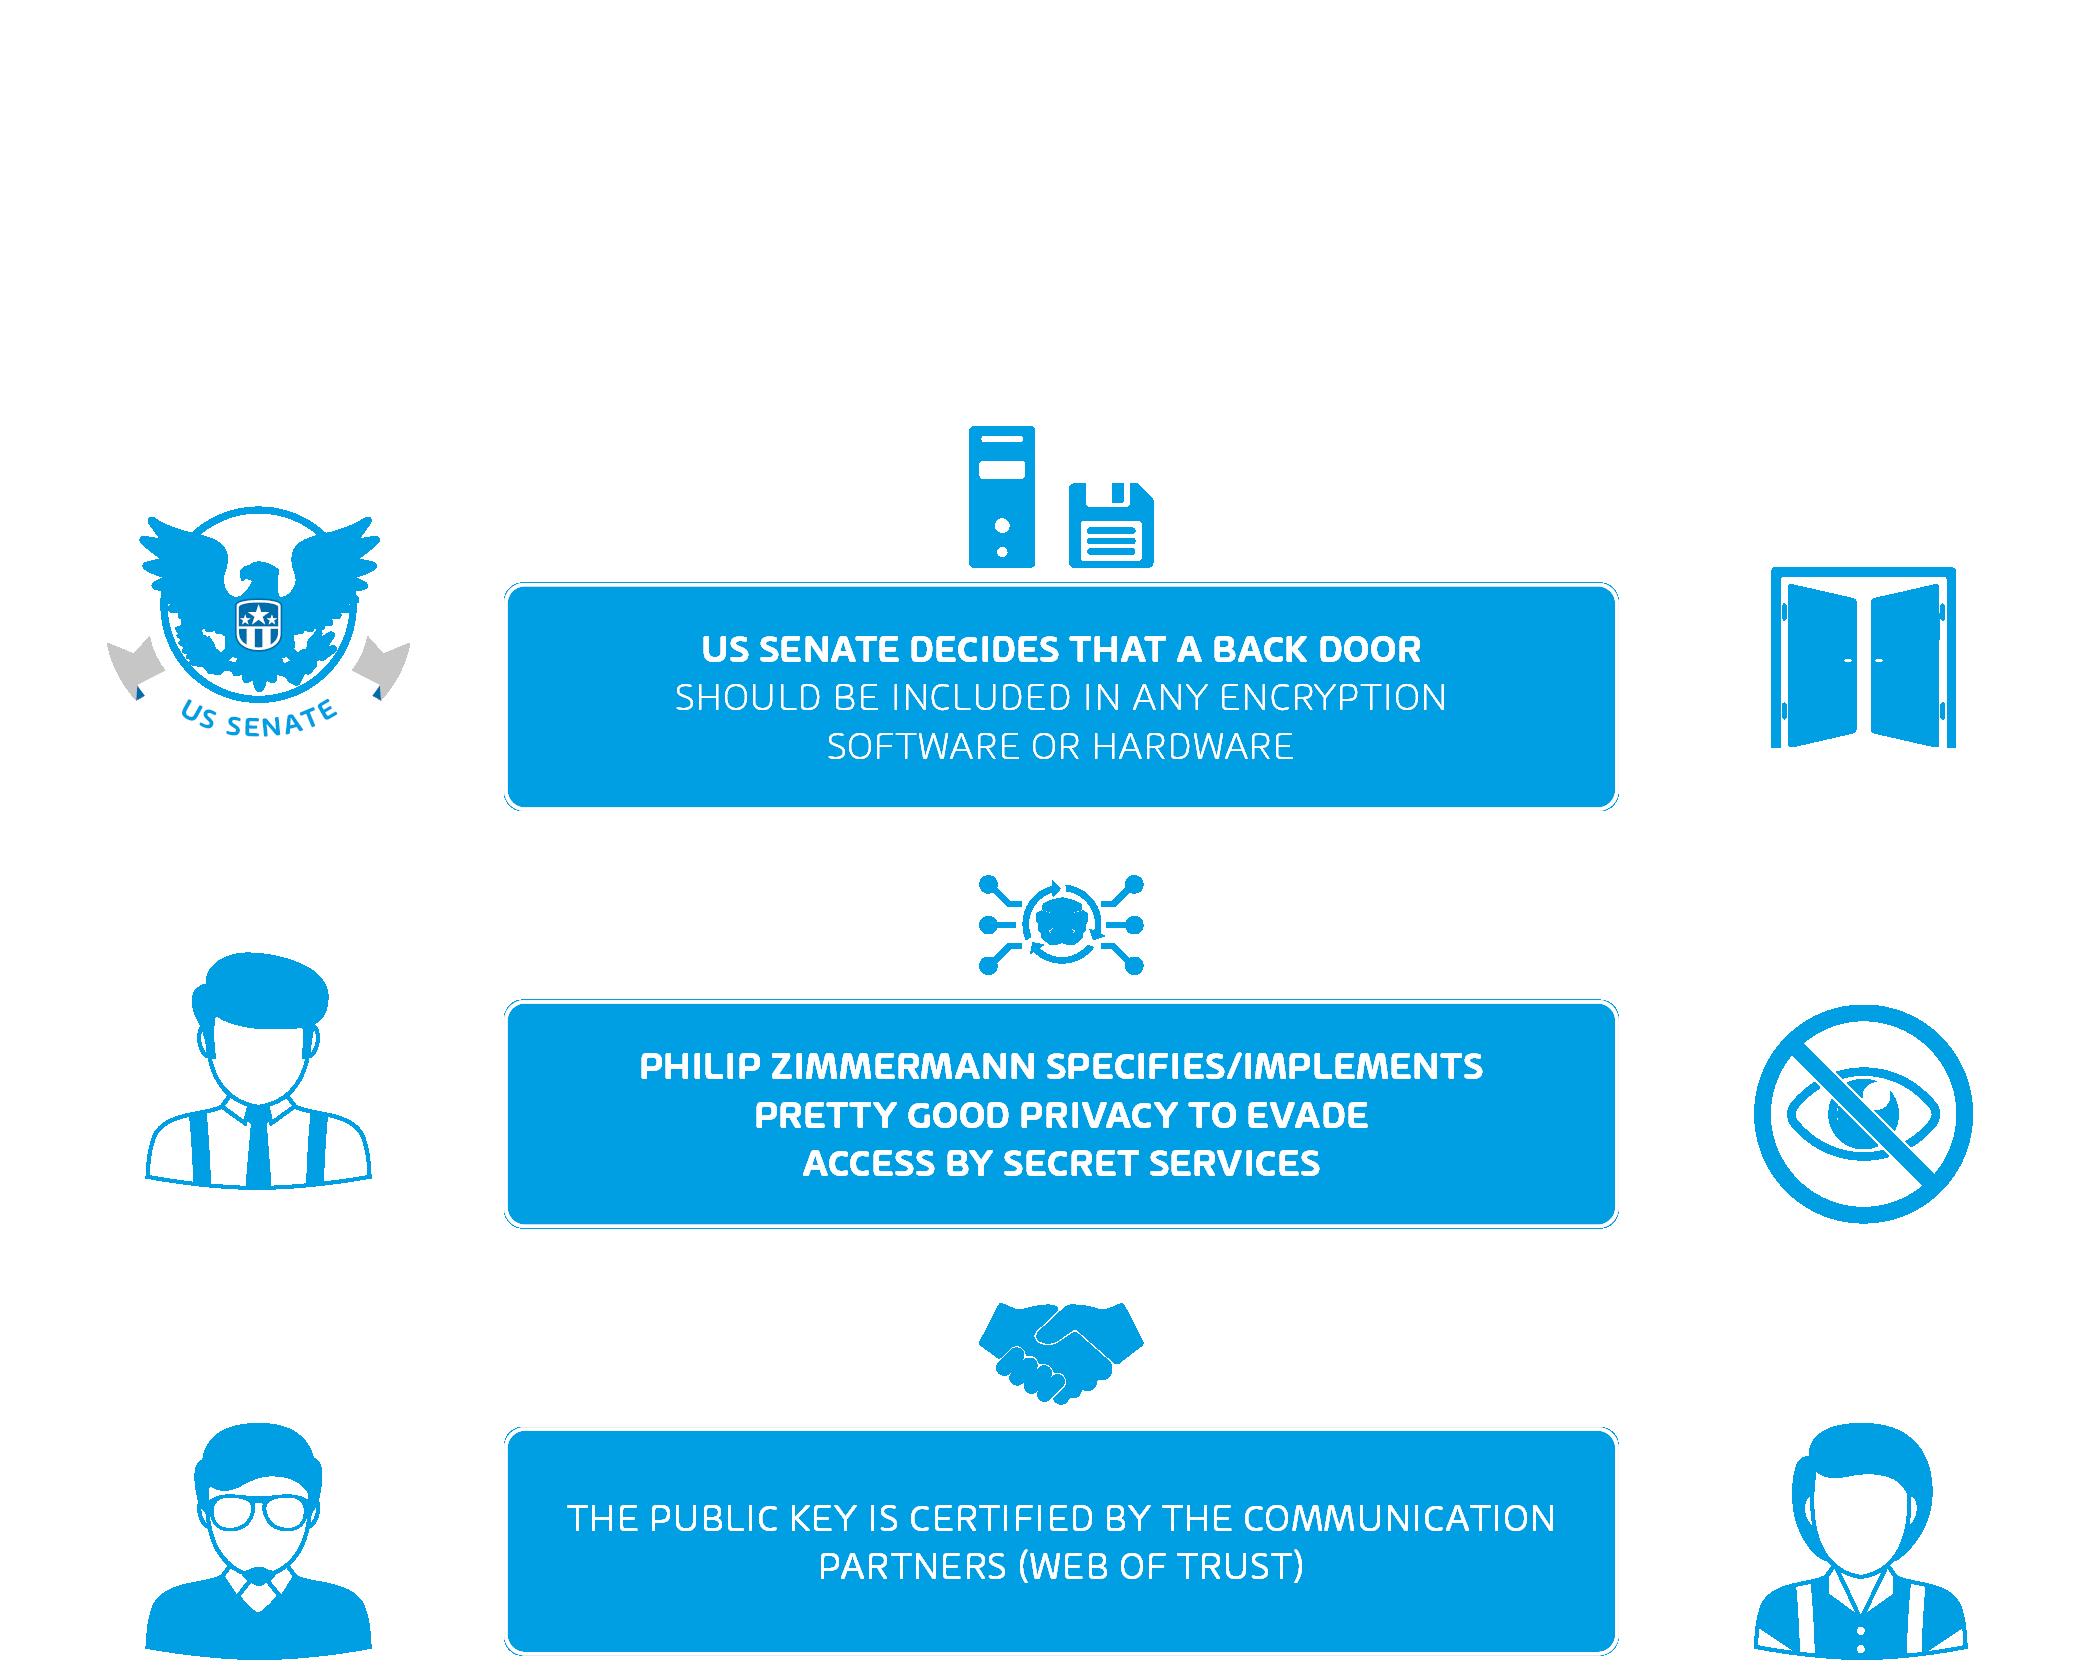 Infografía sobre PGP (Pretty Good Privacy)